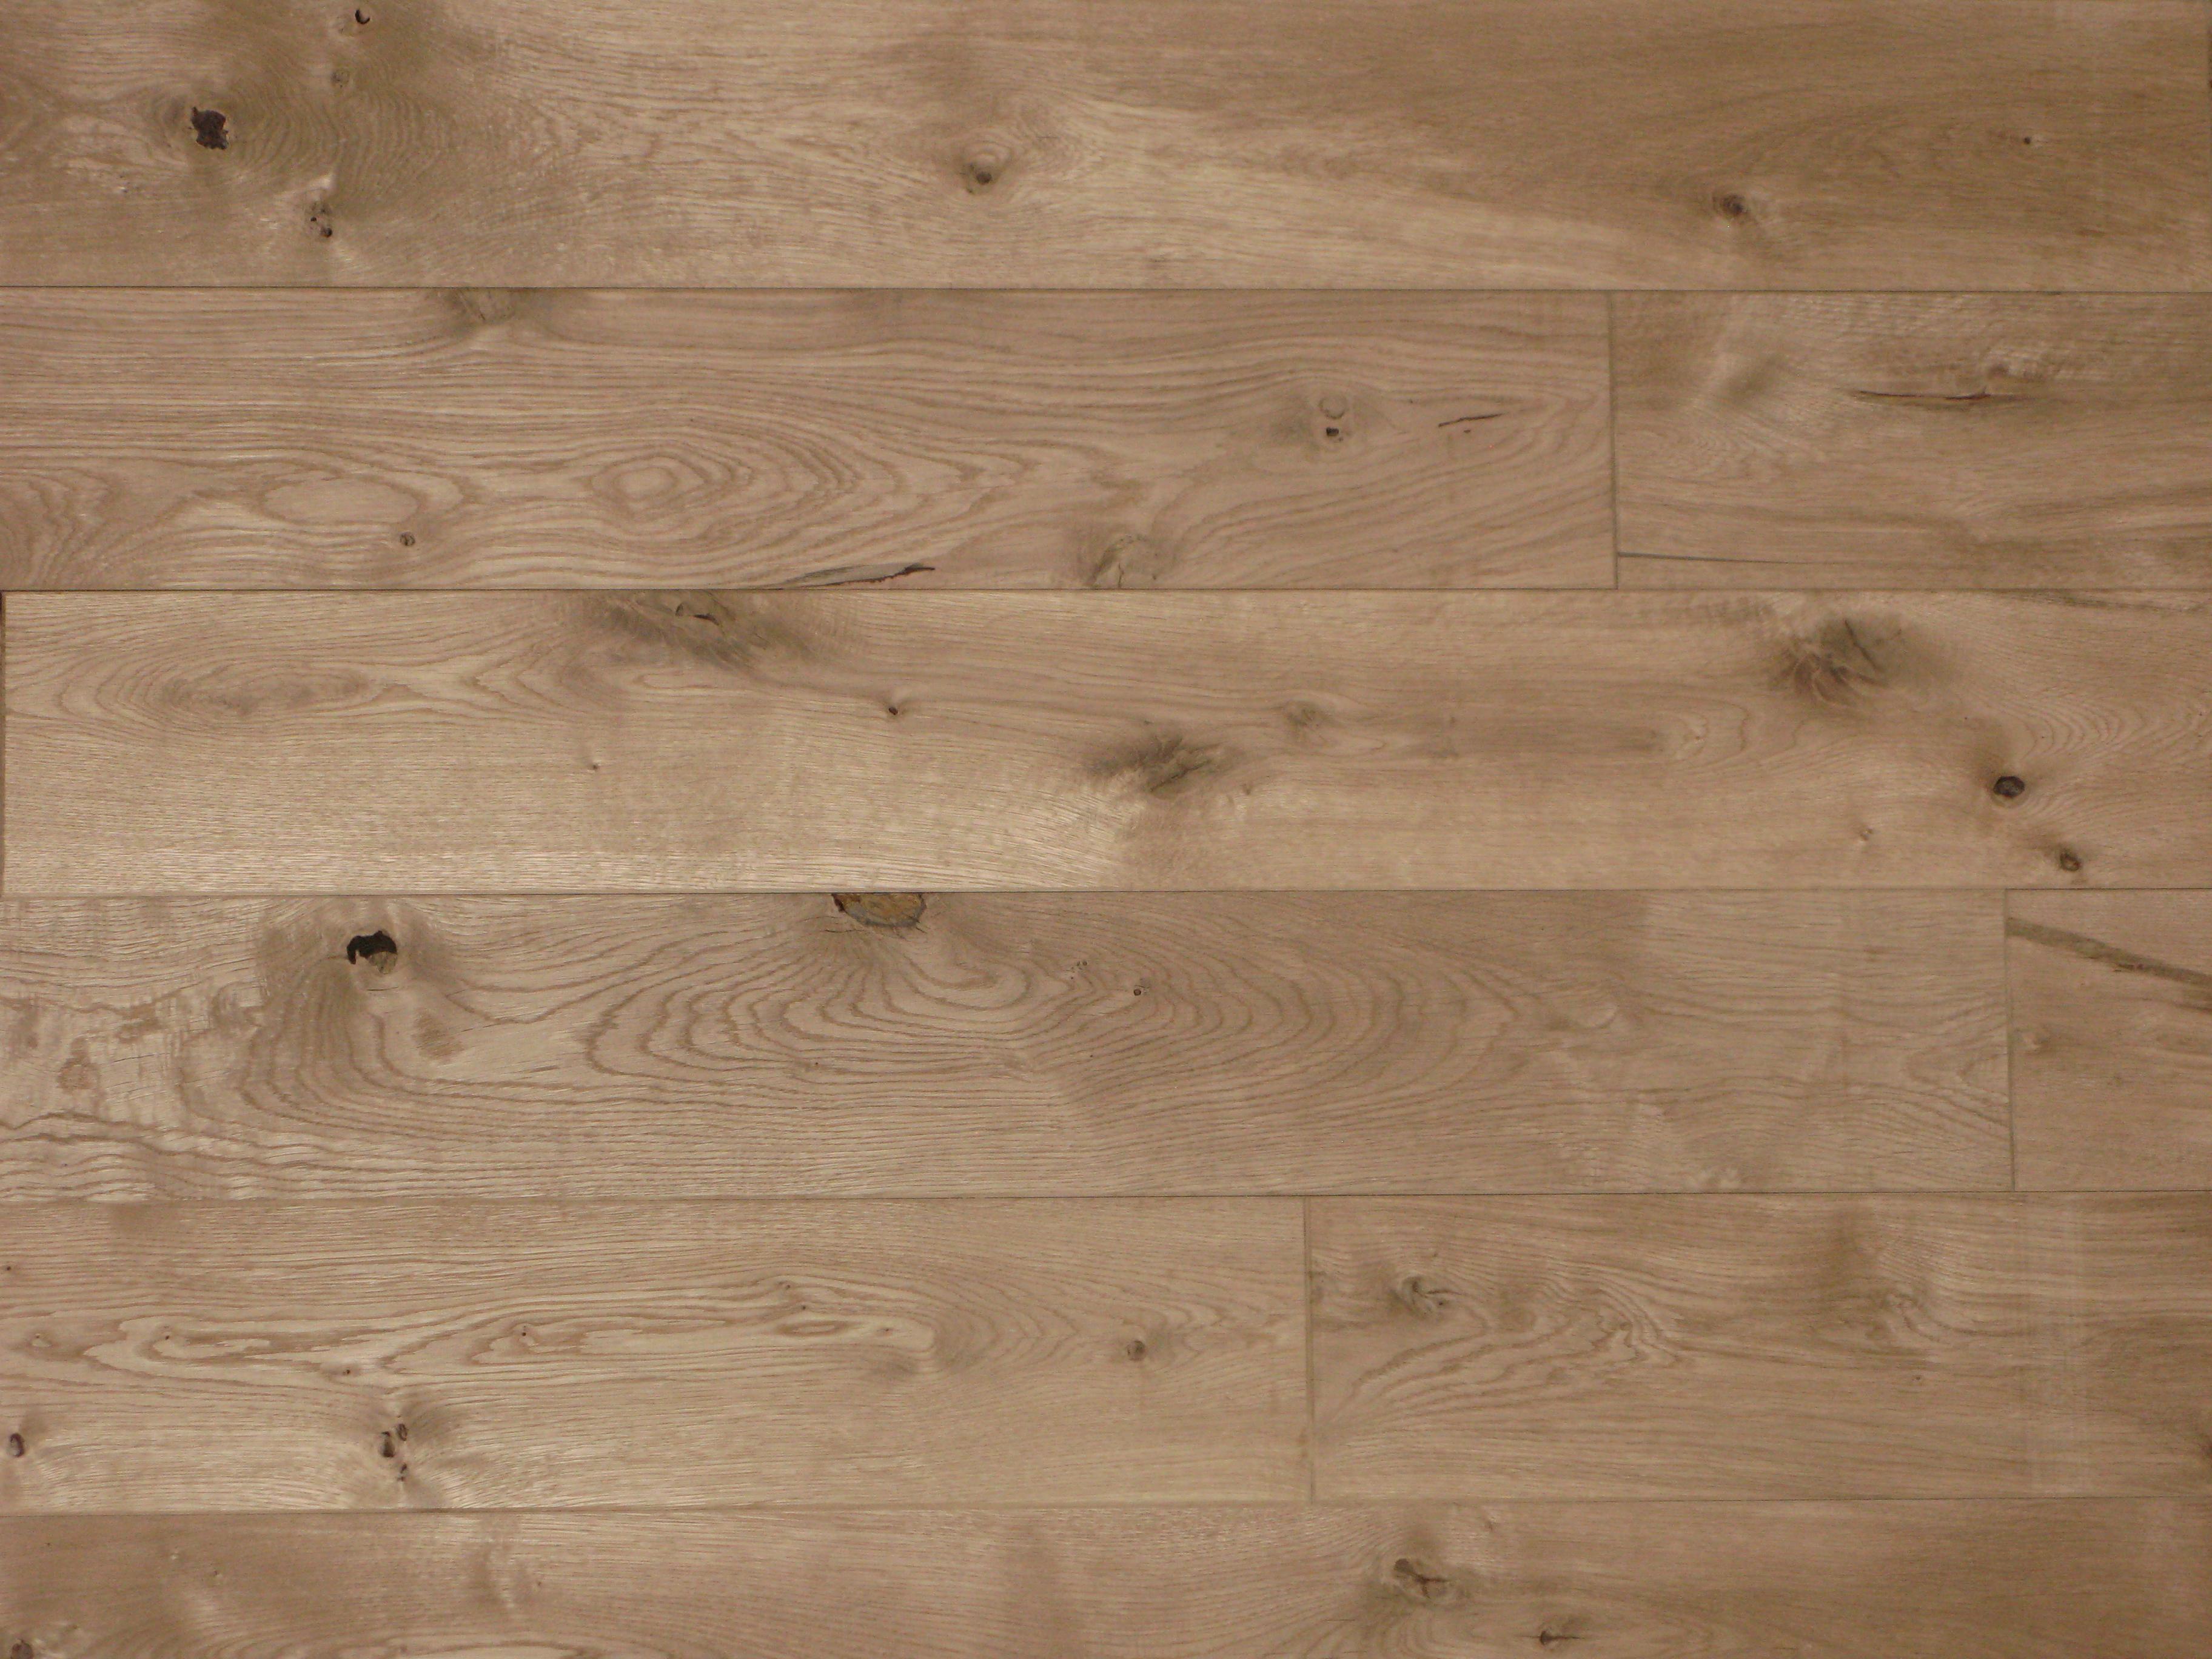 Fußboden Dielen ~ Fußbodendielen rebusta u starke rustyk u andrewpol